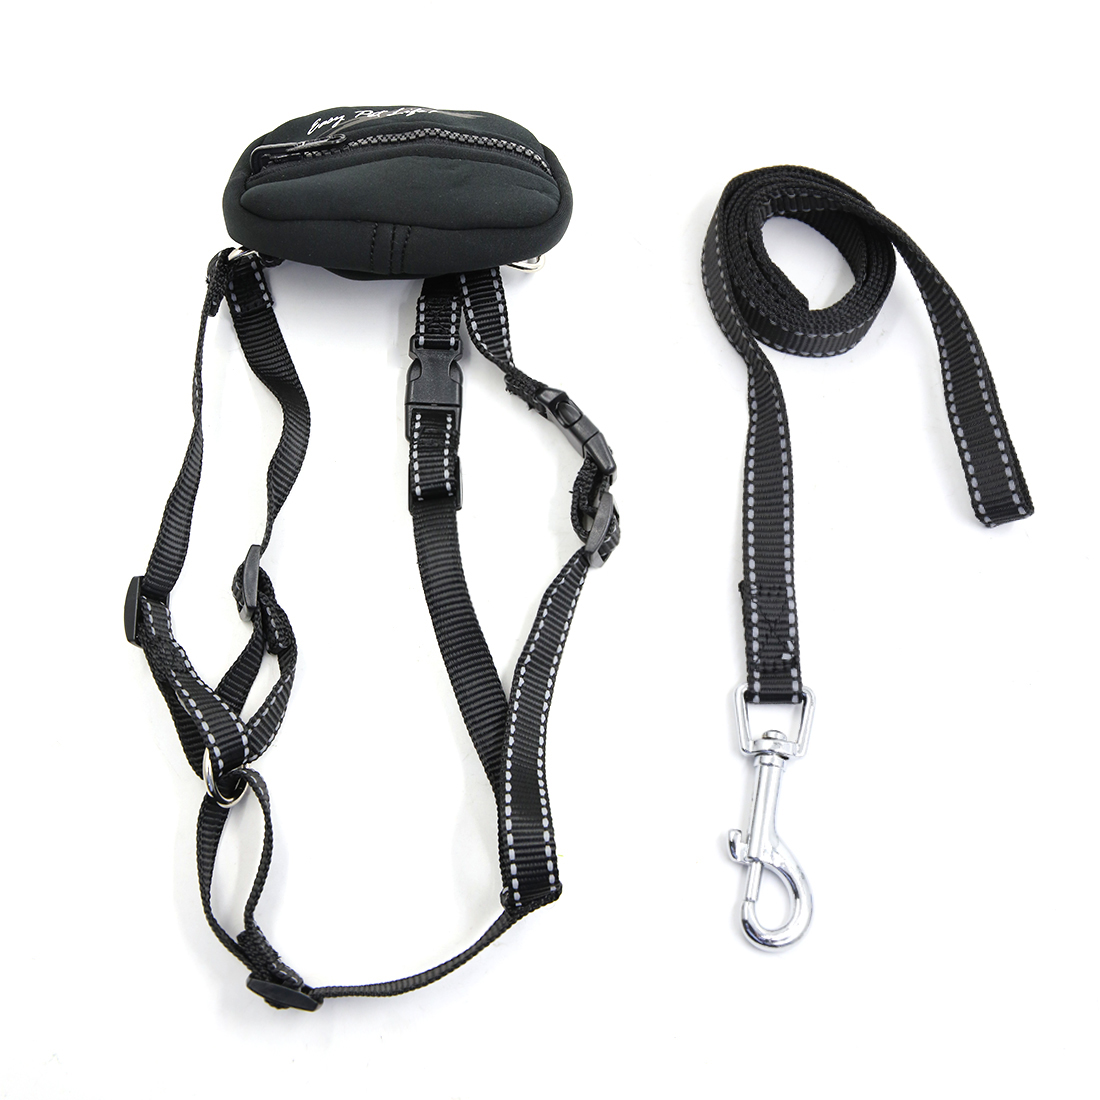 Safe Reflective Dog Harness Leash Adjustable Nylon Collar For Walking with Storage Bag Black S